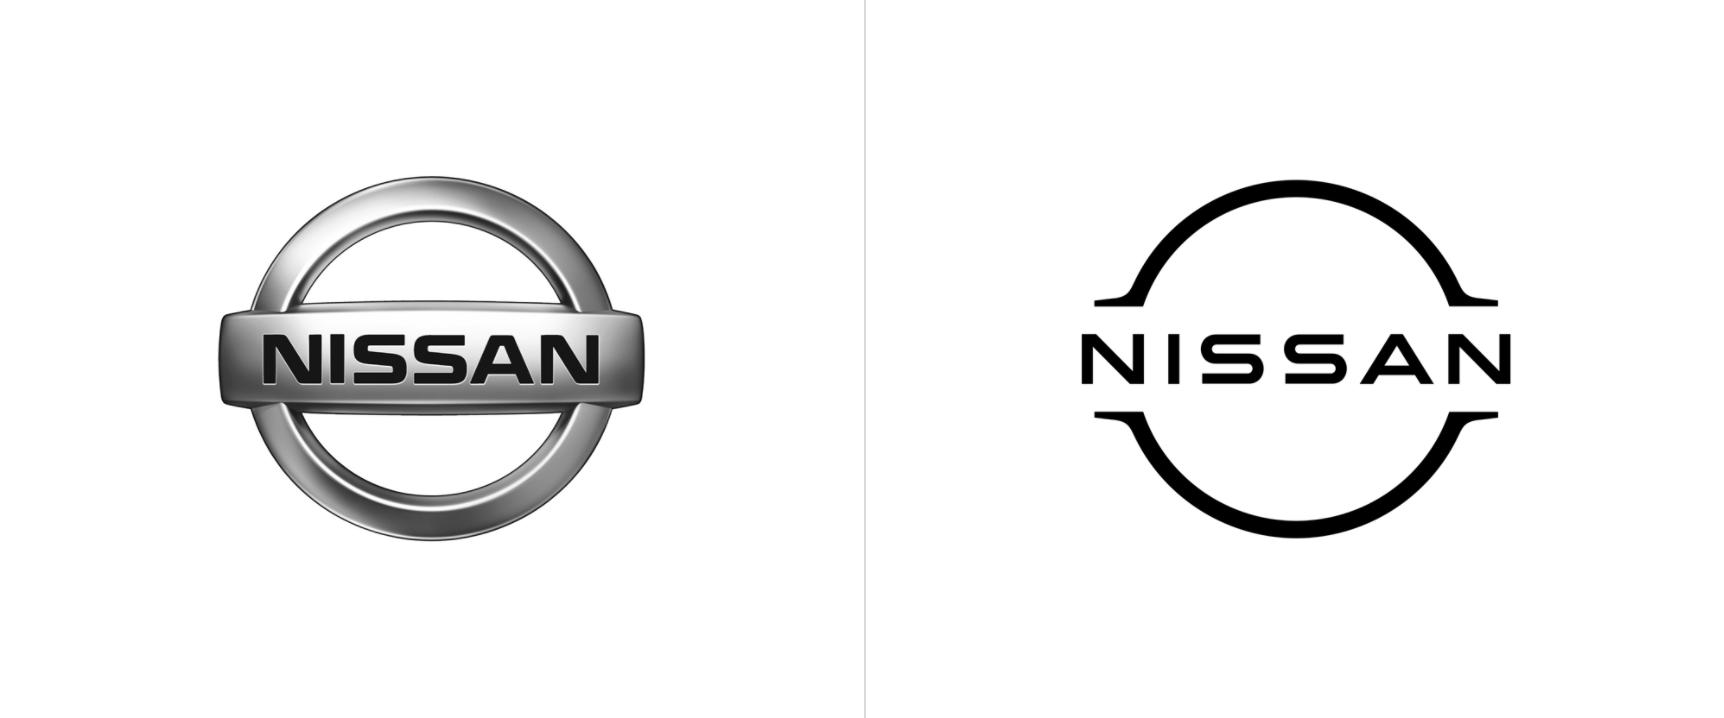 Auto brand trends: Nissan logo